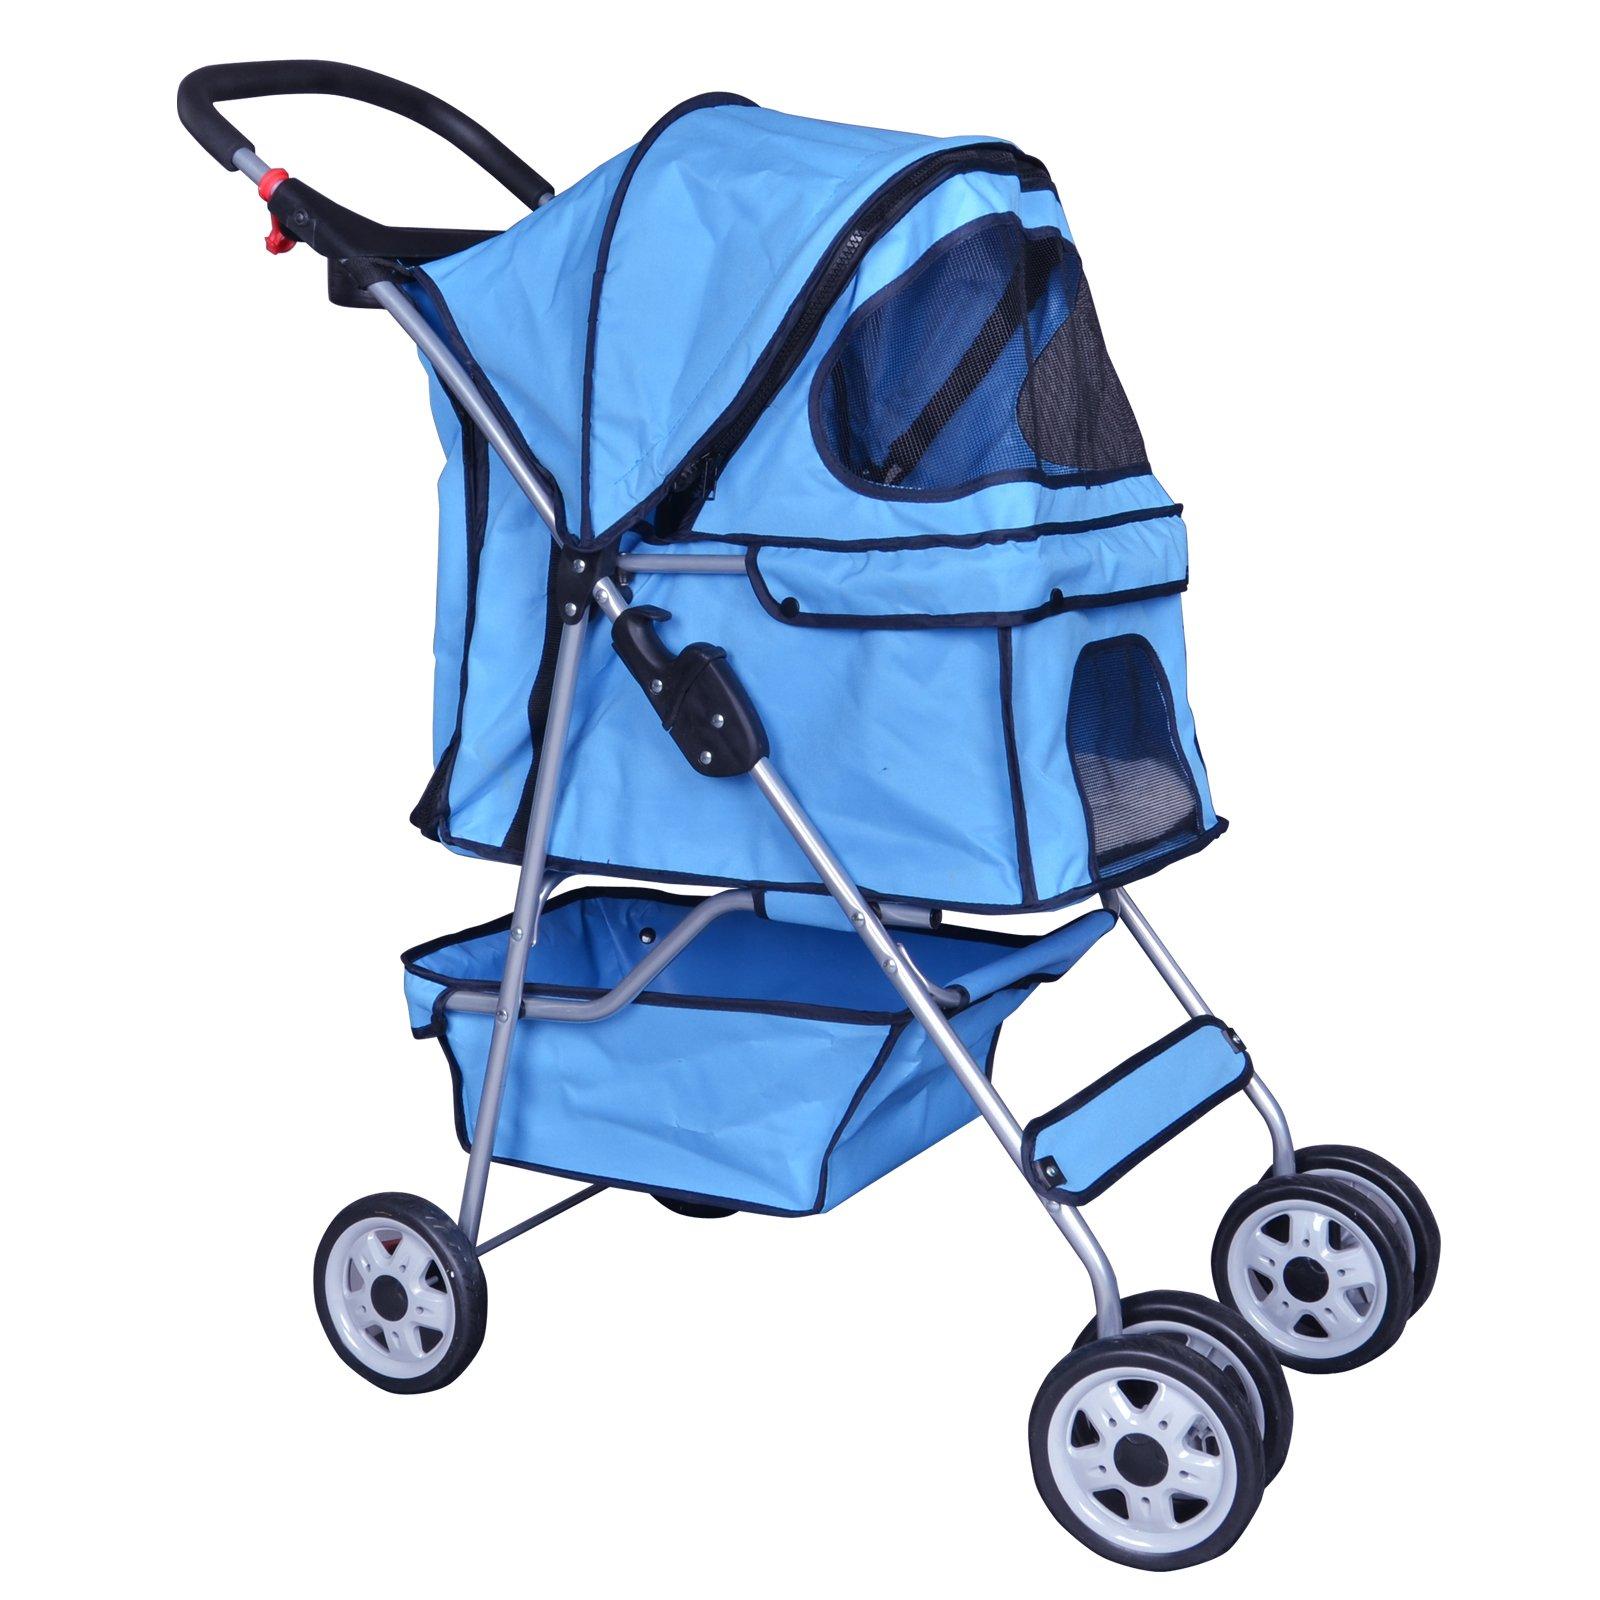 BestPet Blue 4 Wheels Pet Stroller Cat Dog Cage Stroller Travel Folding Carri...